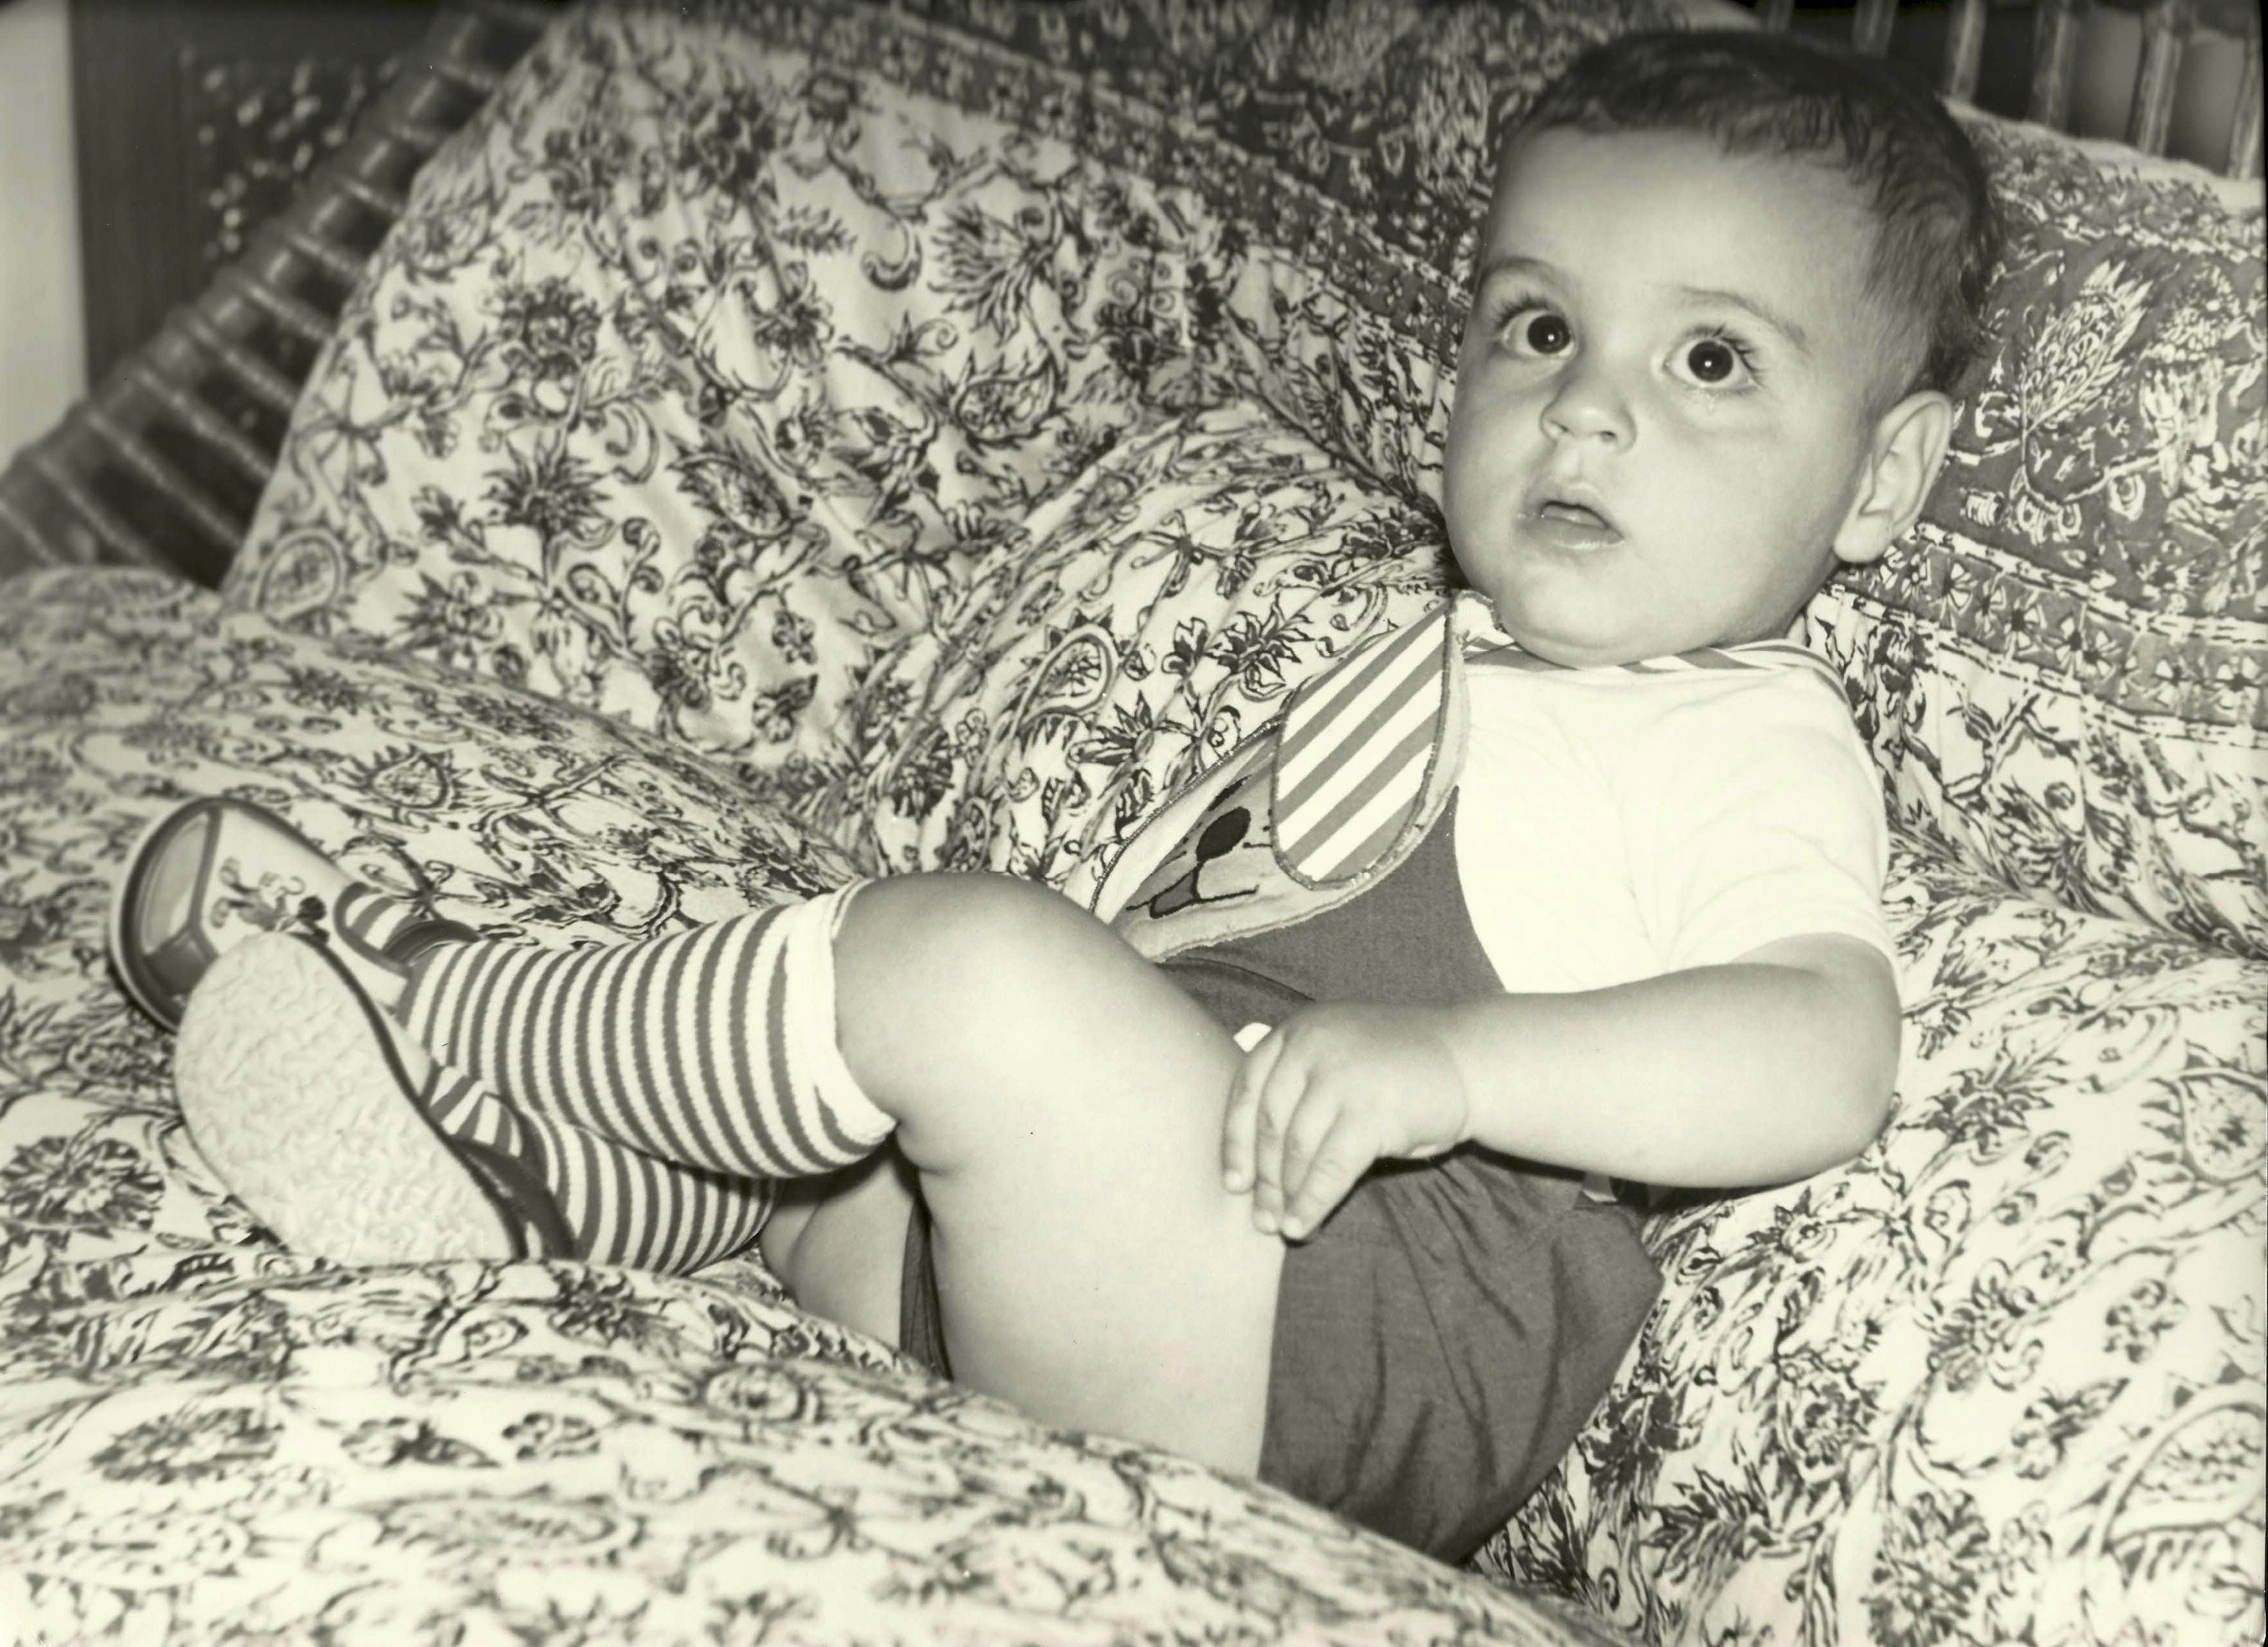 Hugo_Barra_baby.JPG